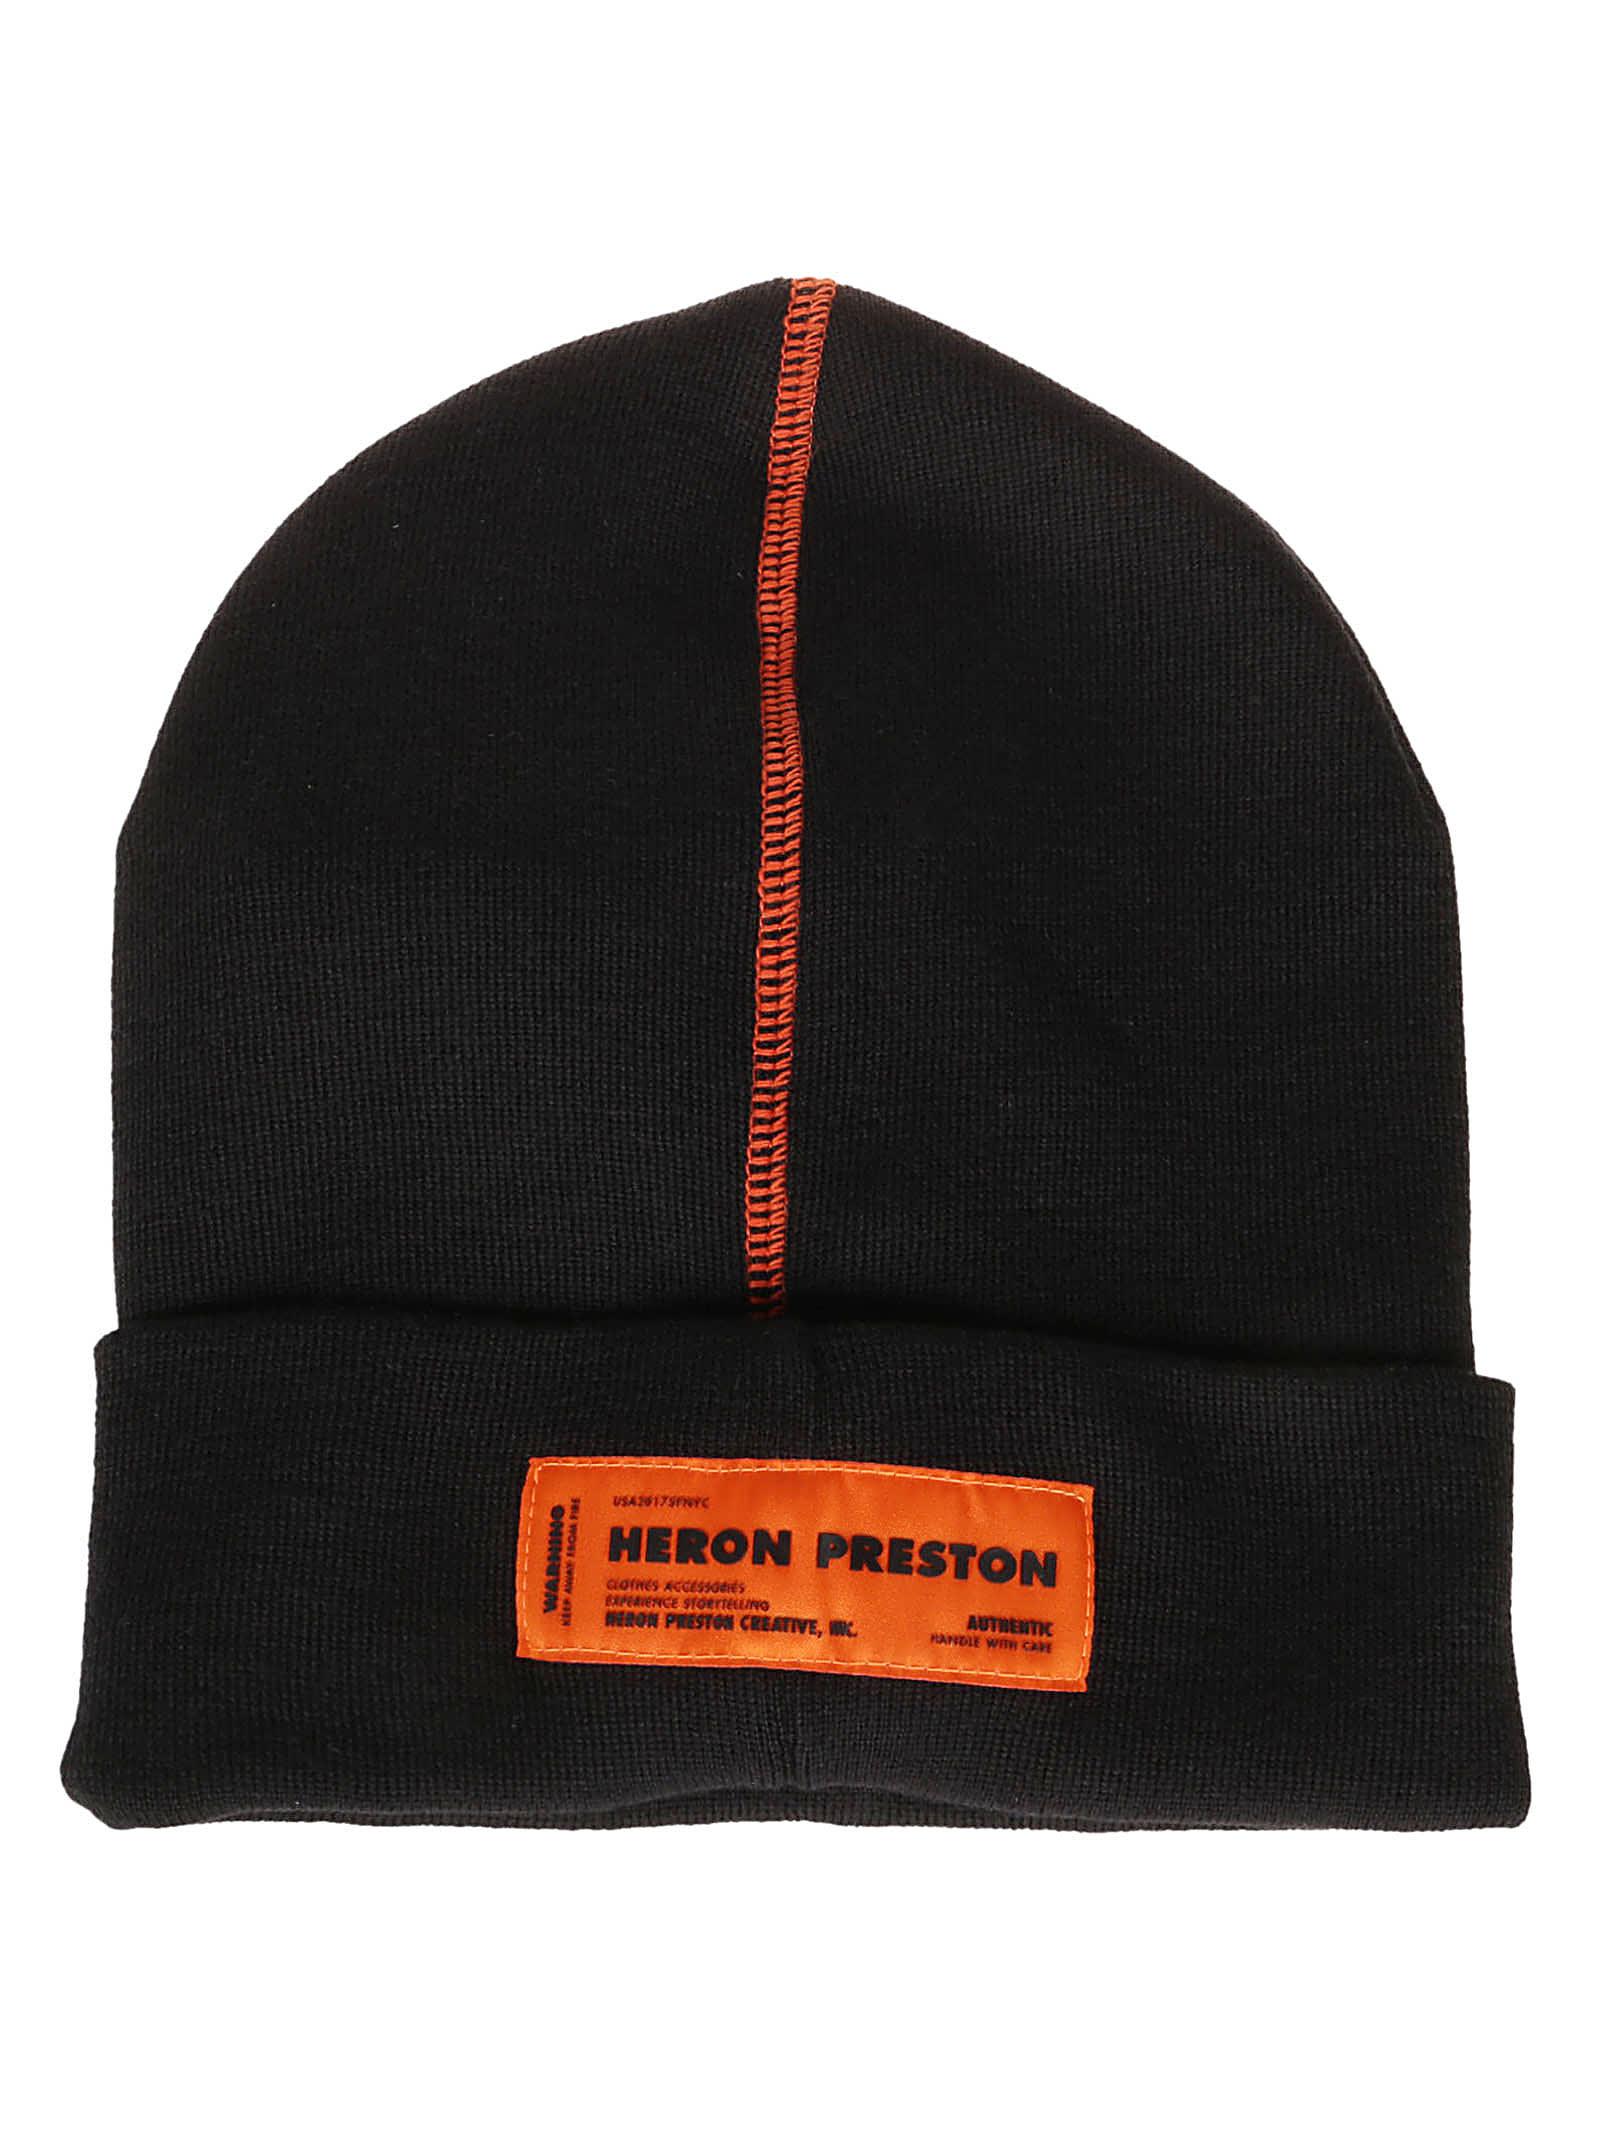 HERON PRESTON Cappello Ctnmb